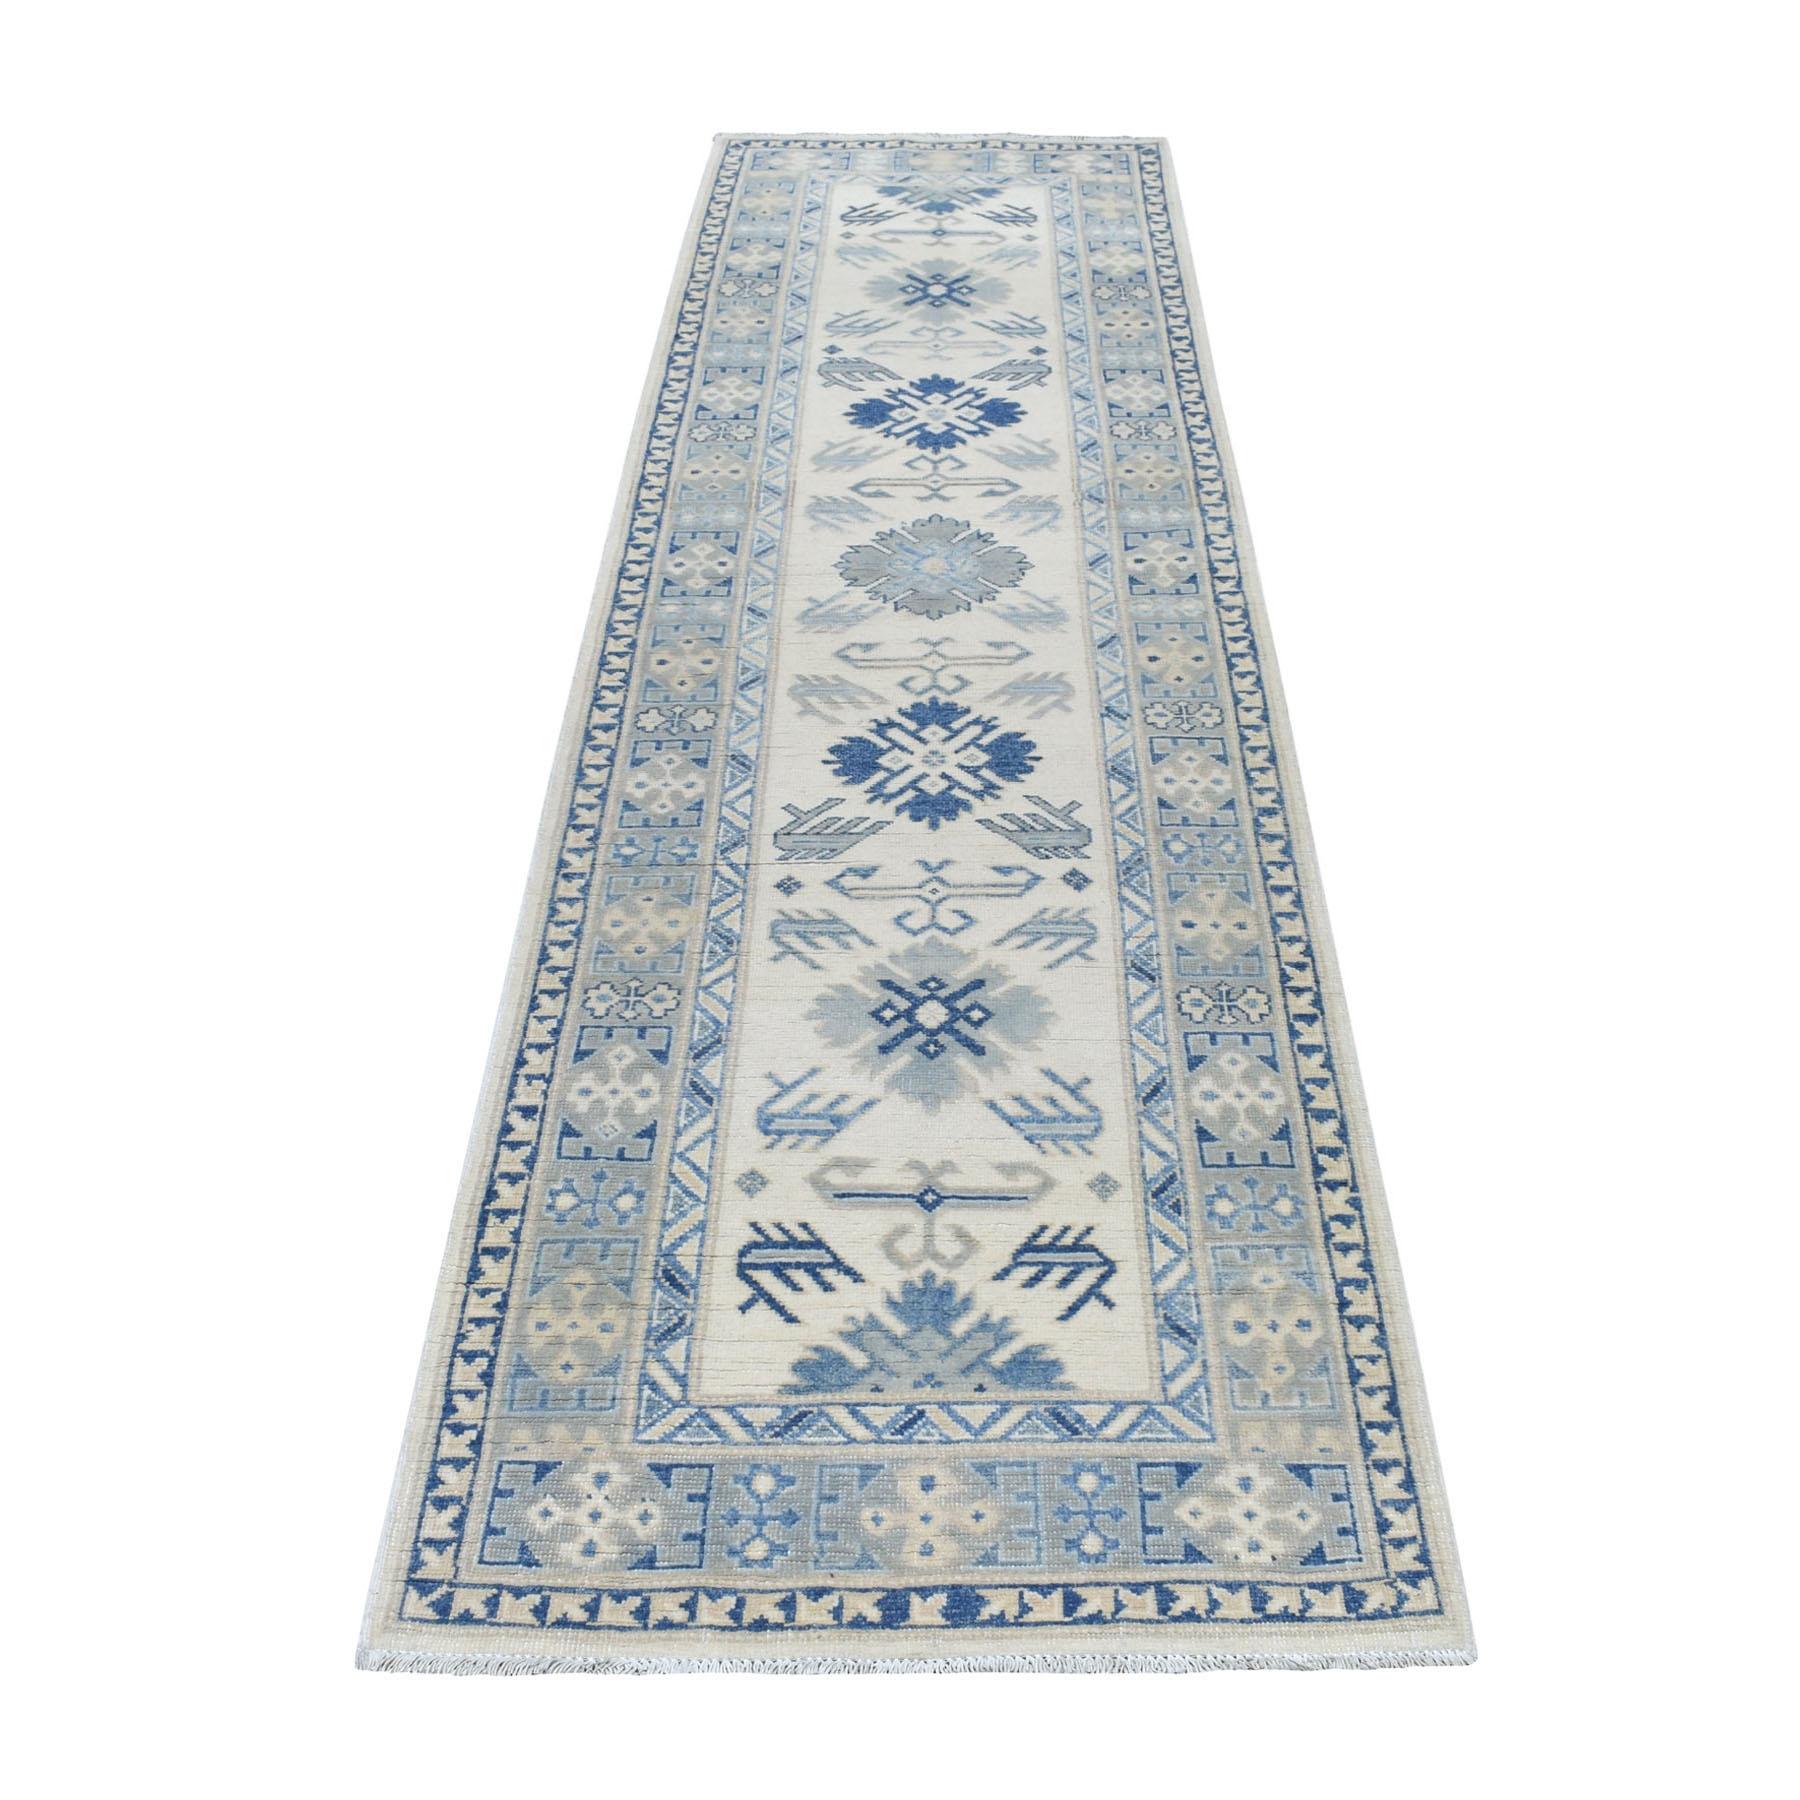 "2'9""x9'8"" Ivory Vintage Look Kazak Pure Wool Tribal Design Hand Knotted Runner Oriental Rug"